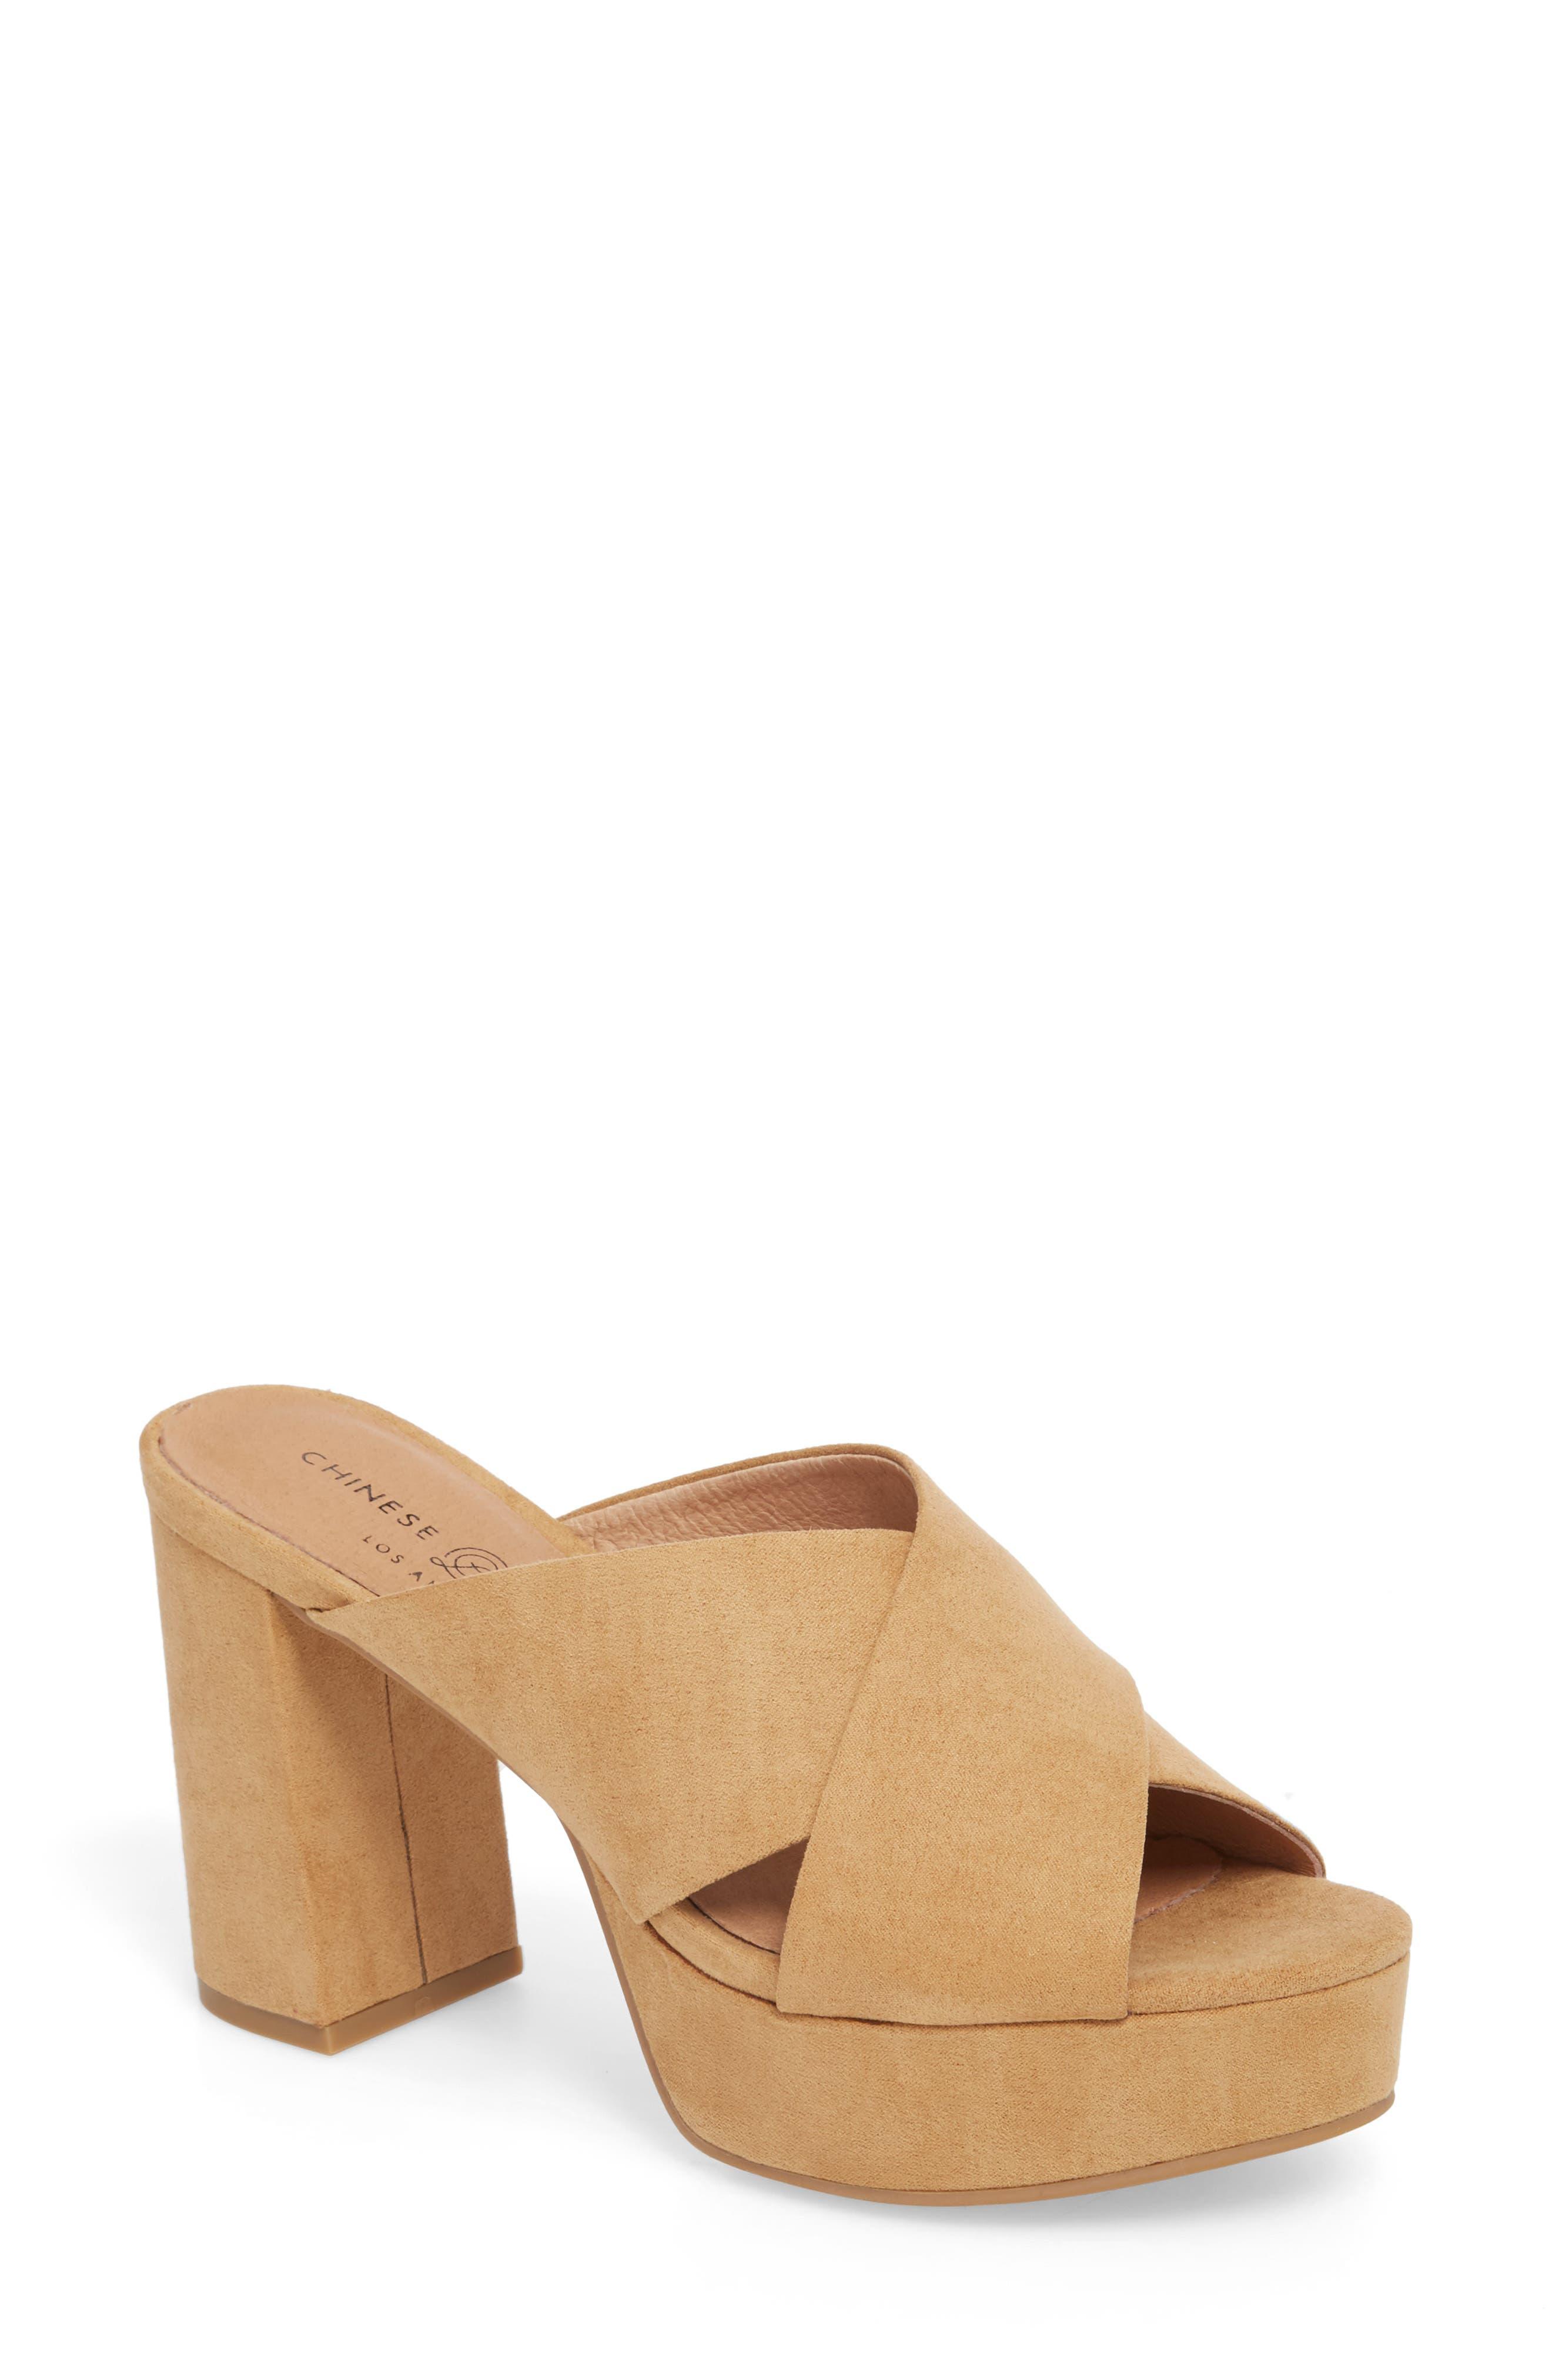 Teagan Cross Strap Platform Sandal,                             Main thumbnail 1, color,                             Camel